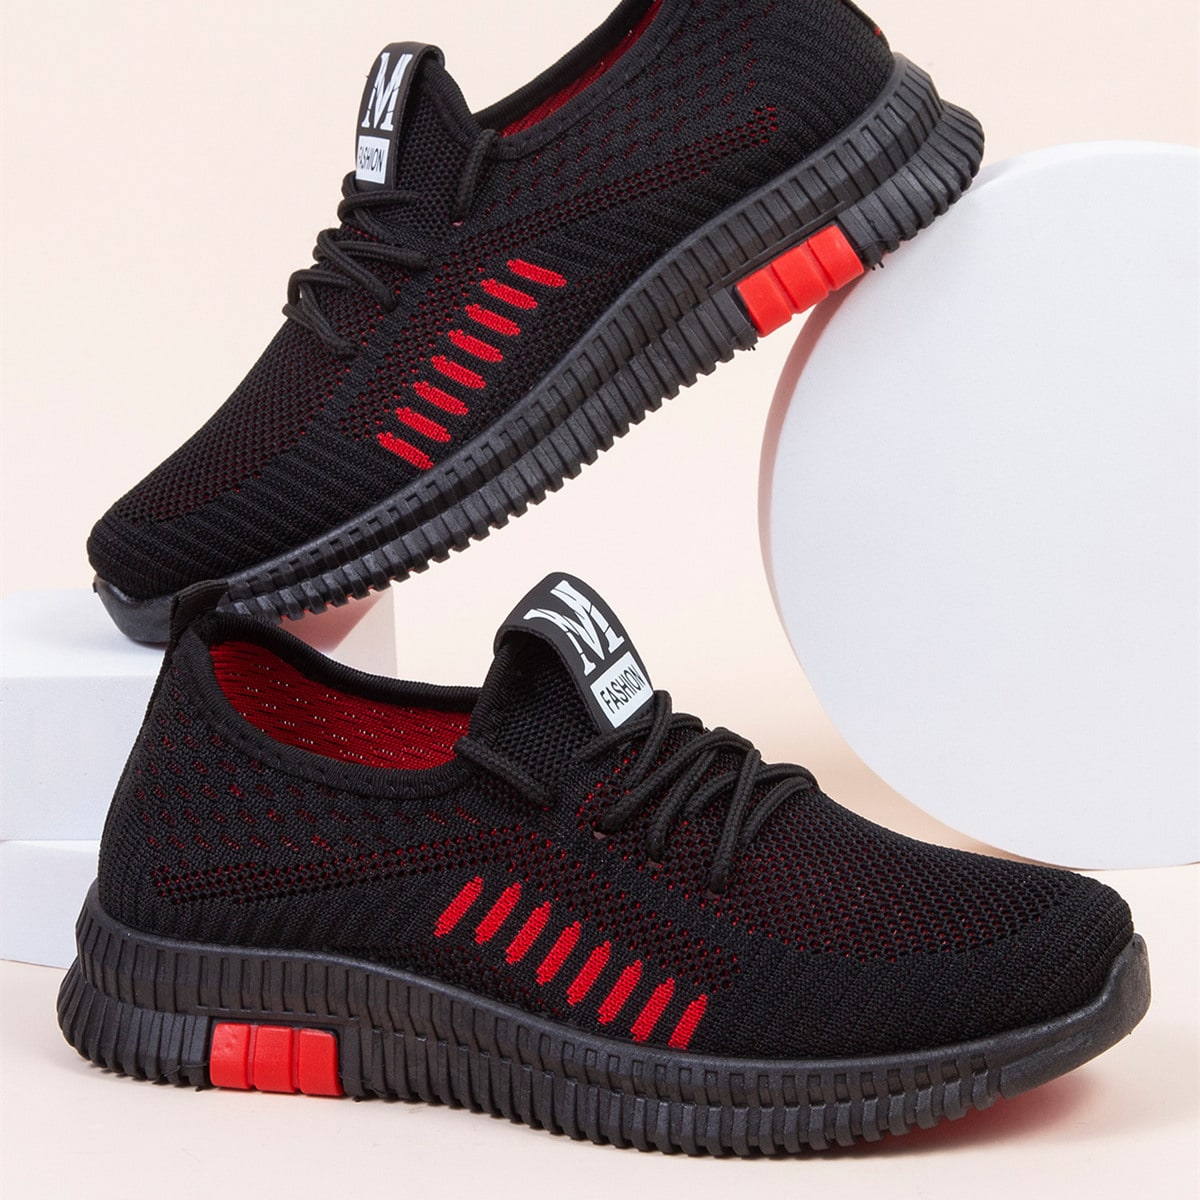 shein Gestreept Sneaker Kant